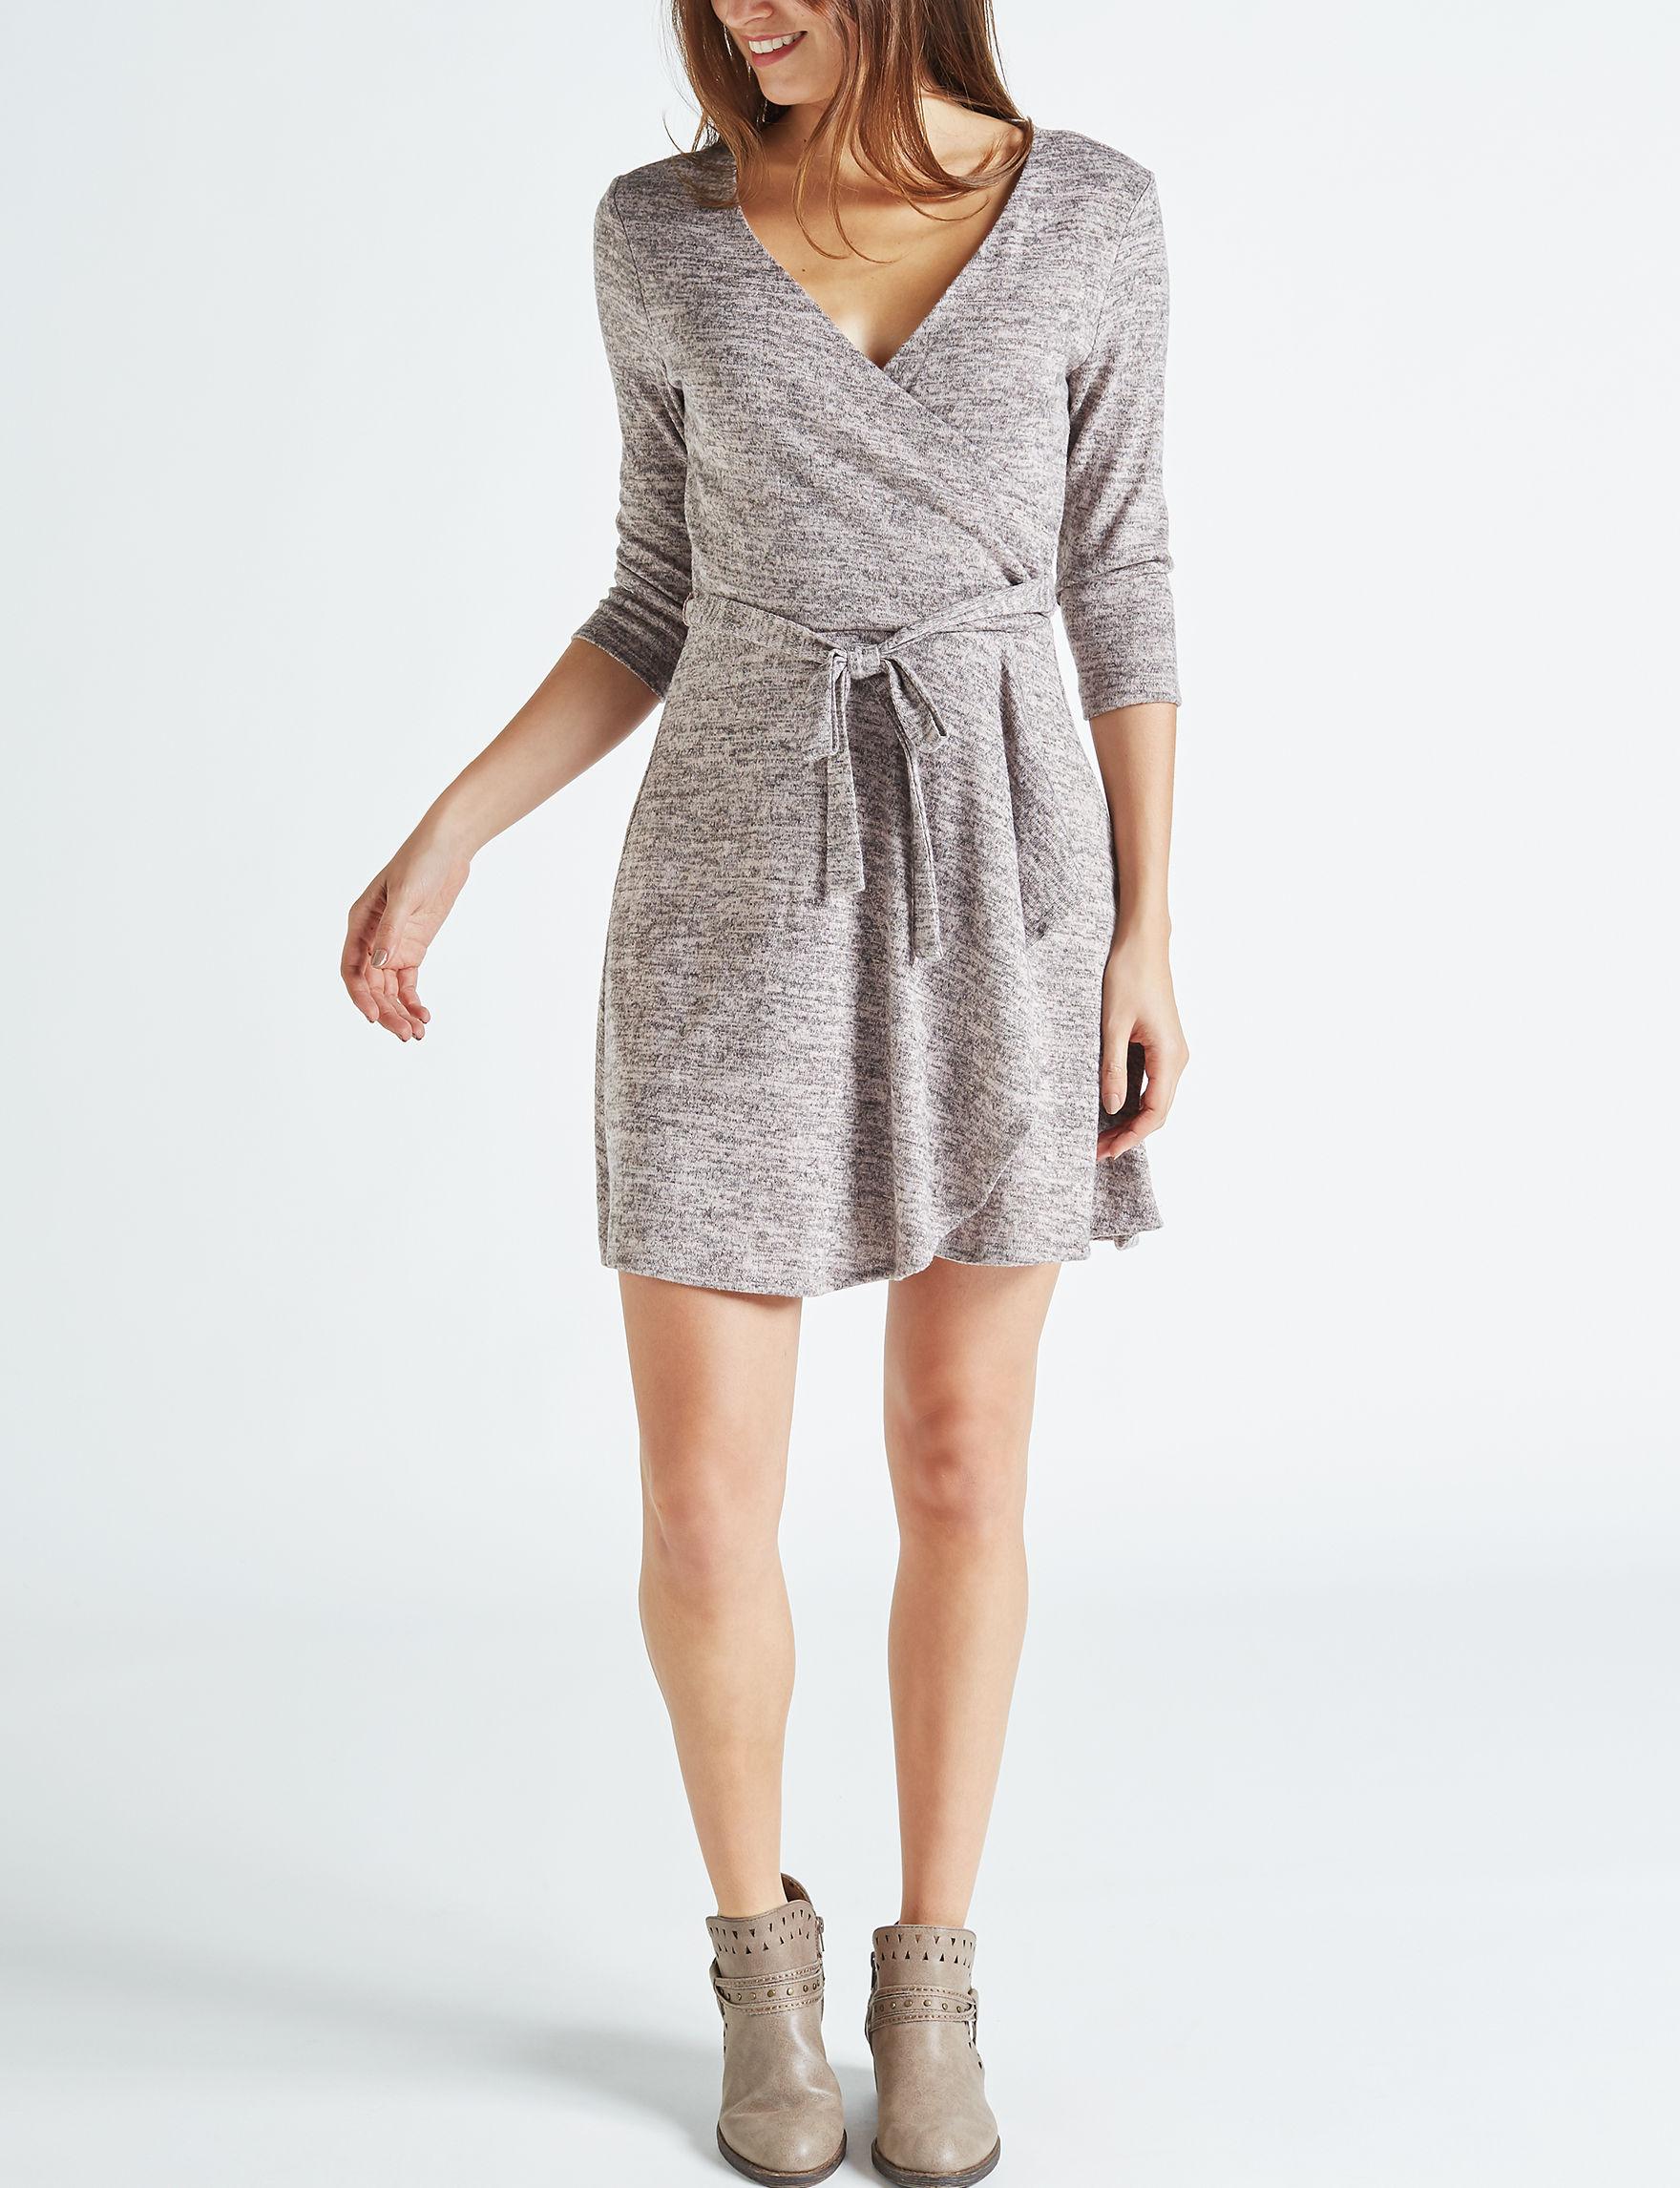 BeBop Blush Everyday & Casual A-line Dresses Sweater Dresses